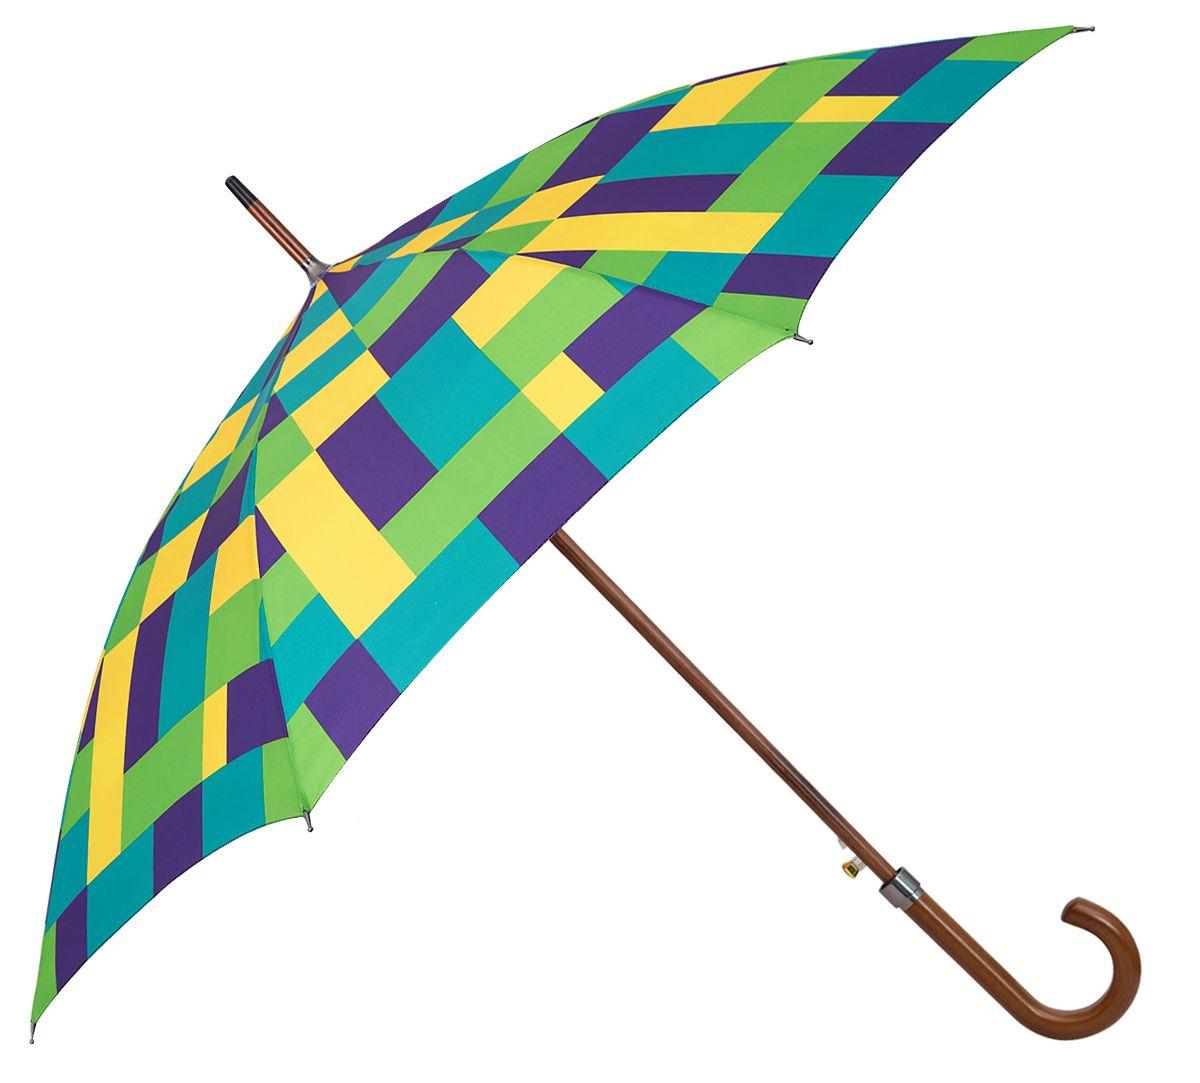 Trichromatic Progression Umbrella